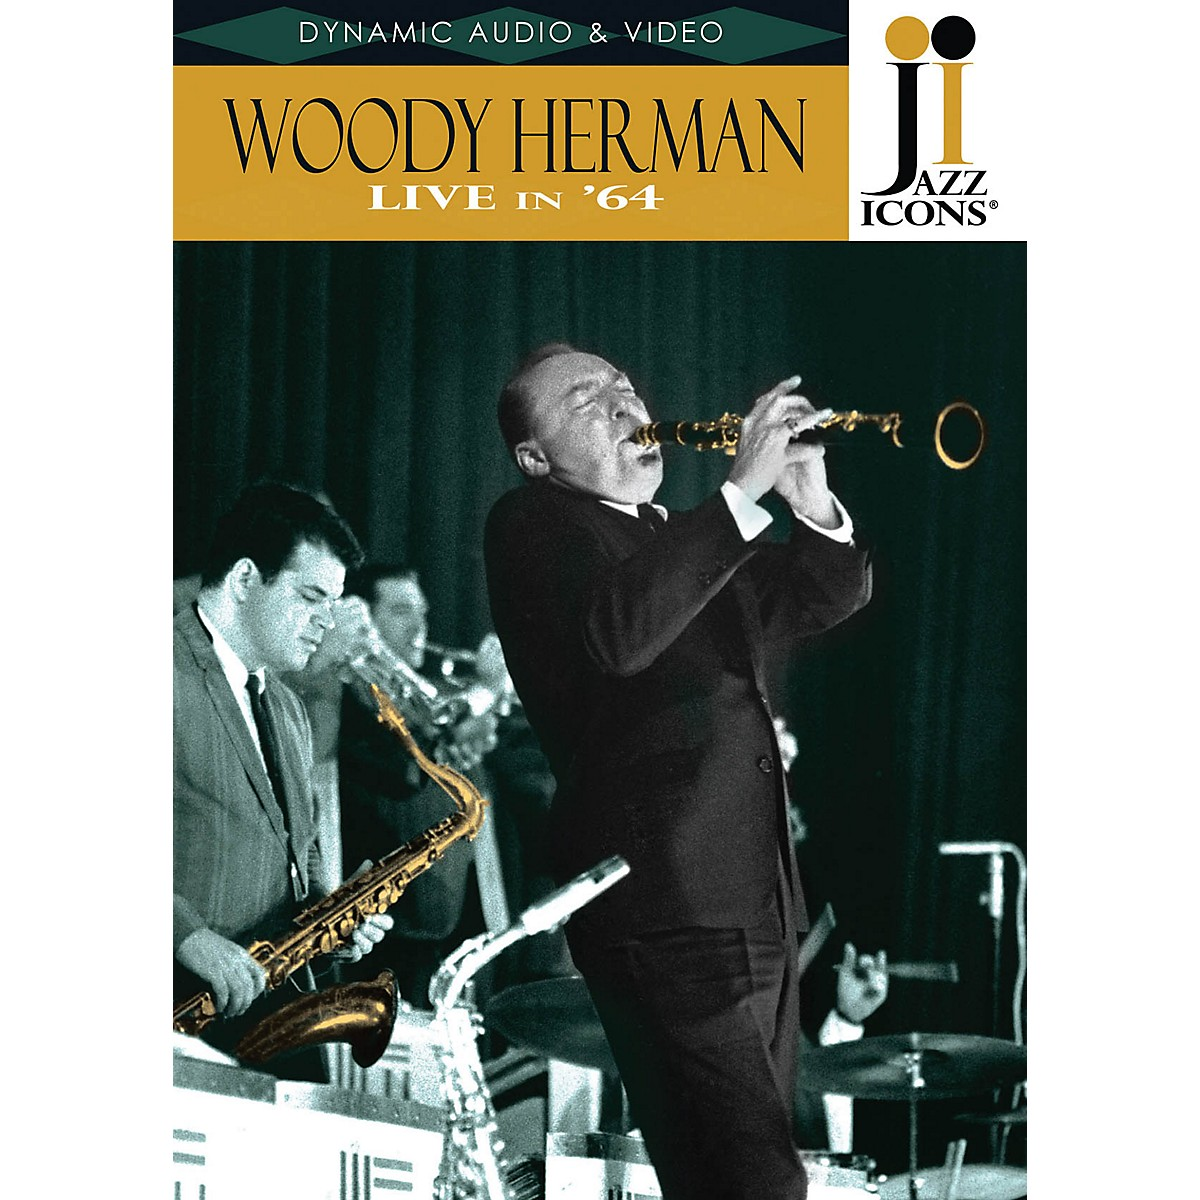 Jazz Icons Woody Herman - Live in '64 (Jazz Icons DVD) DVD Series DVD Performed by Woody Herman